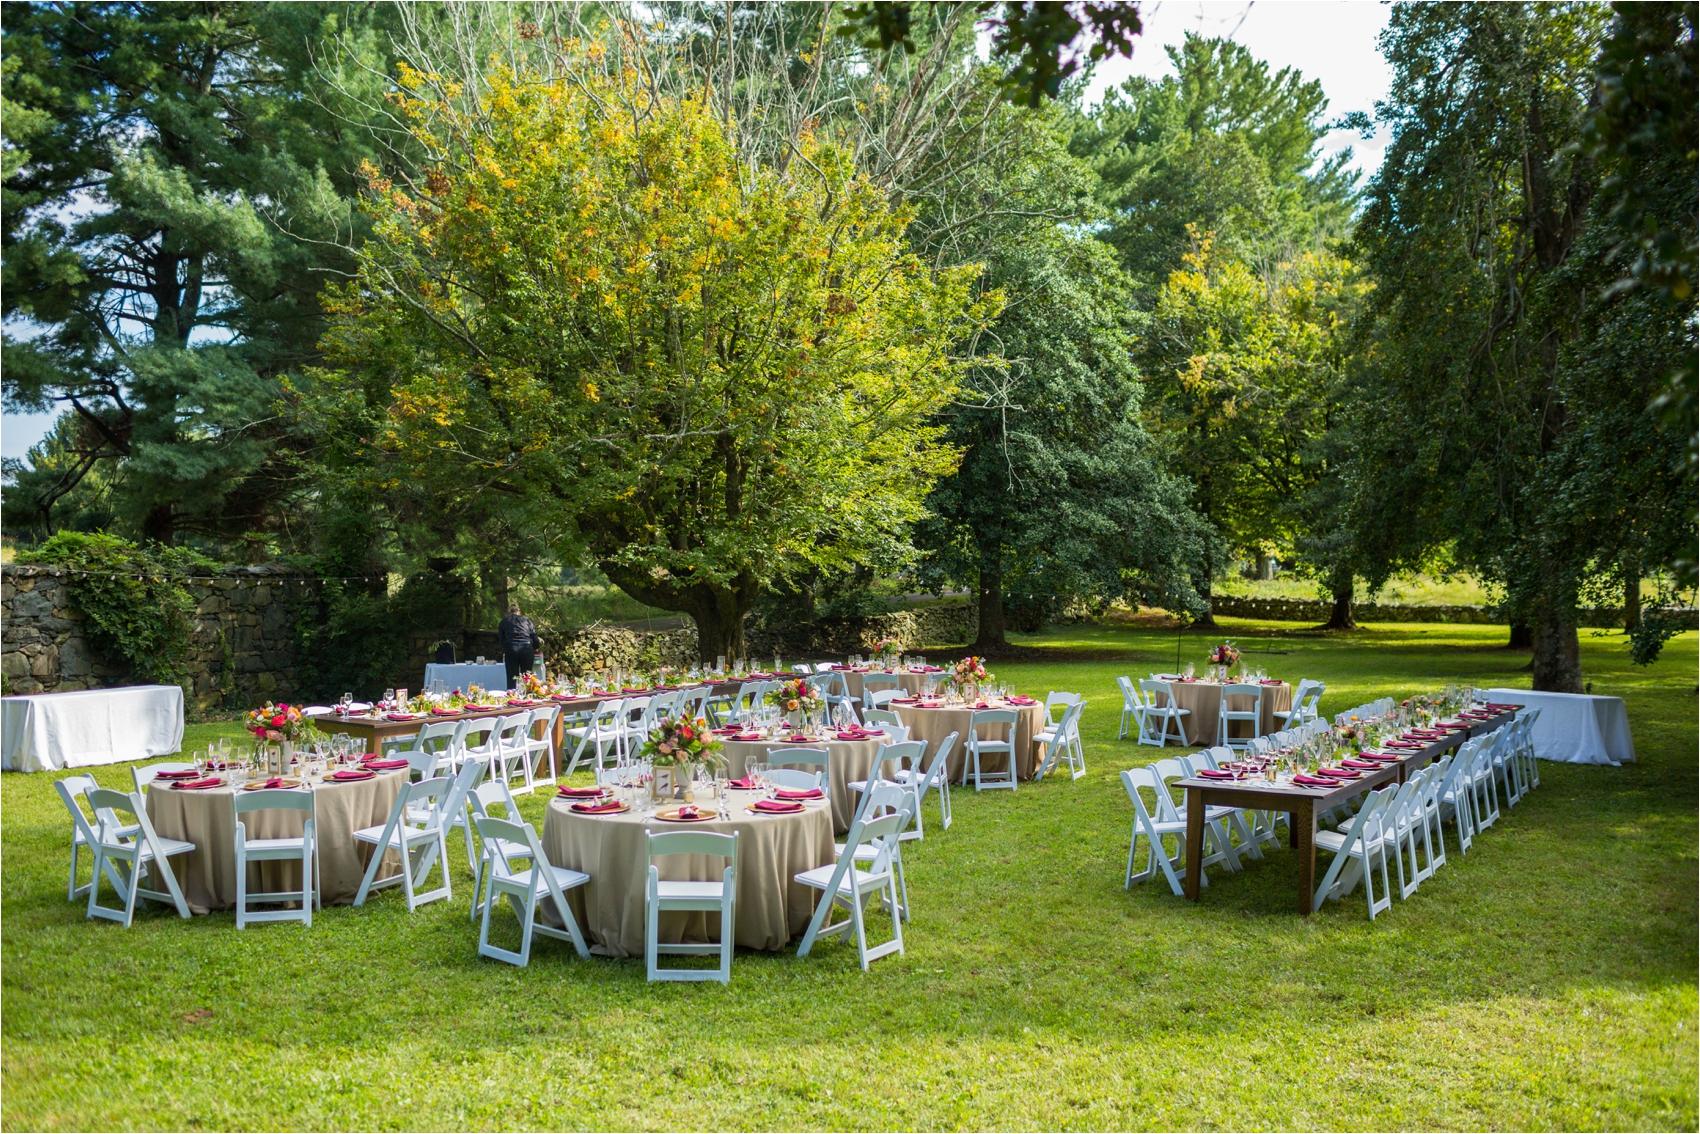 Feather-and-Oak-Rainforest-Trust-Virginia-Wedding-0336.jpg